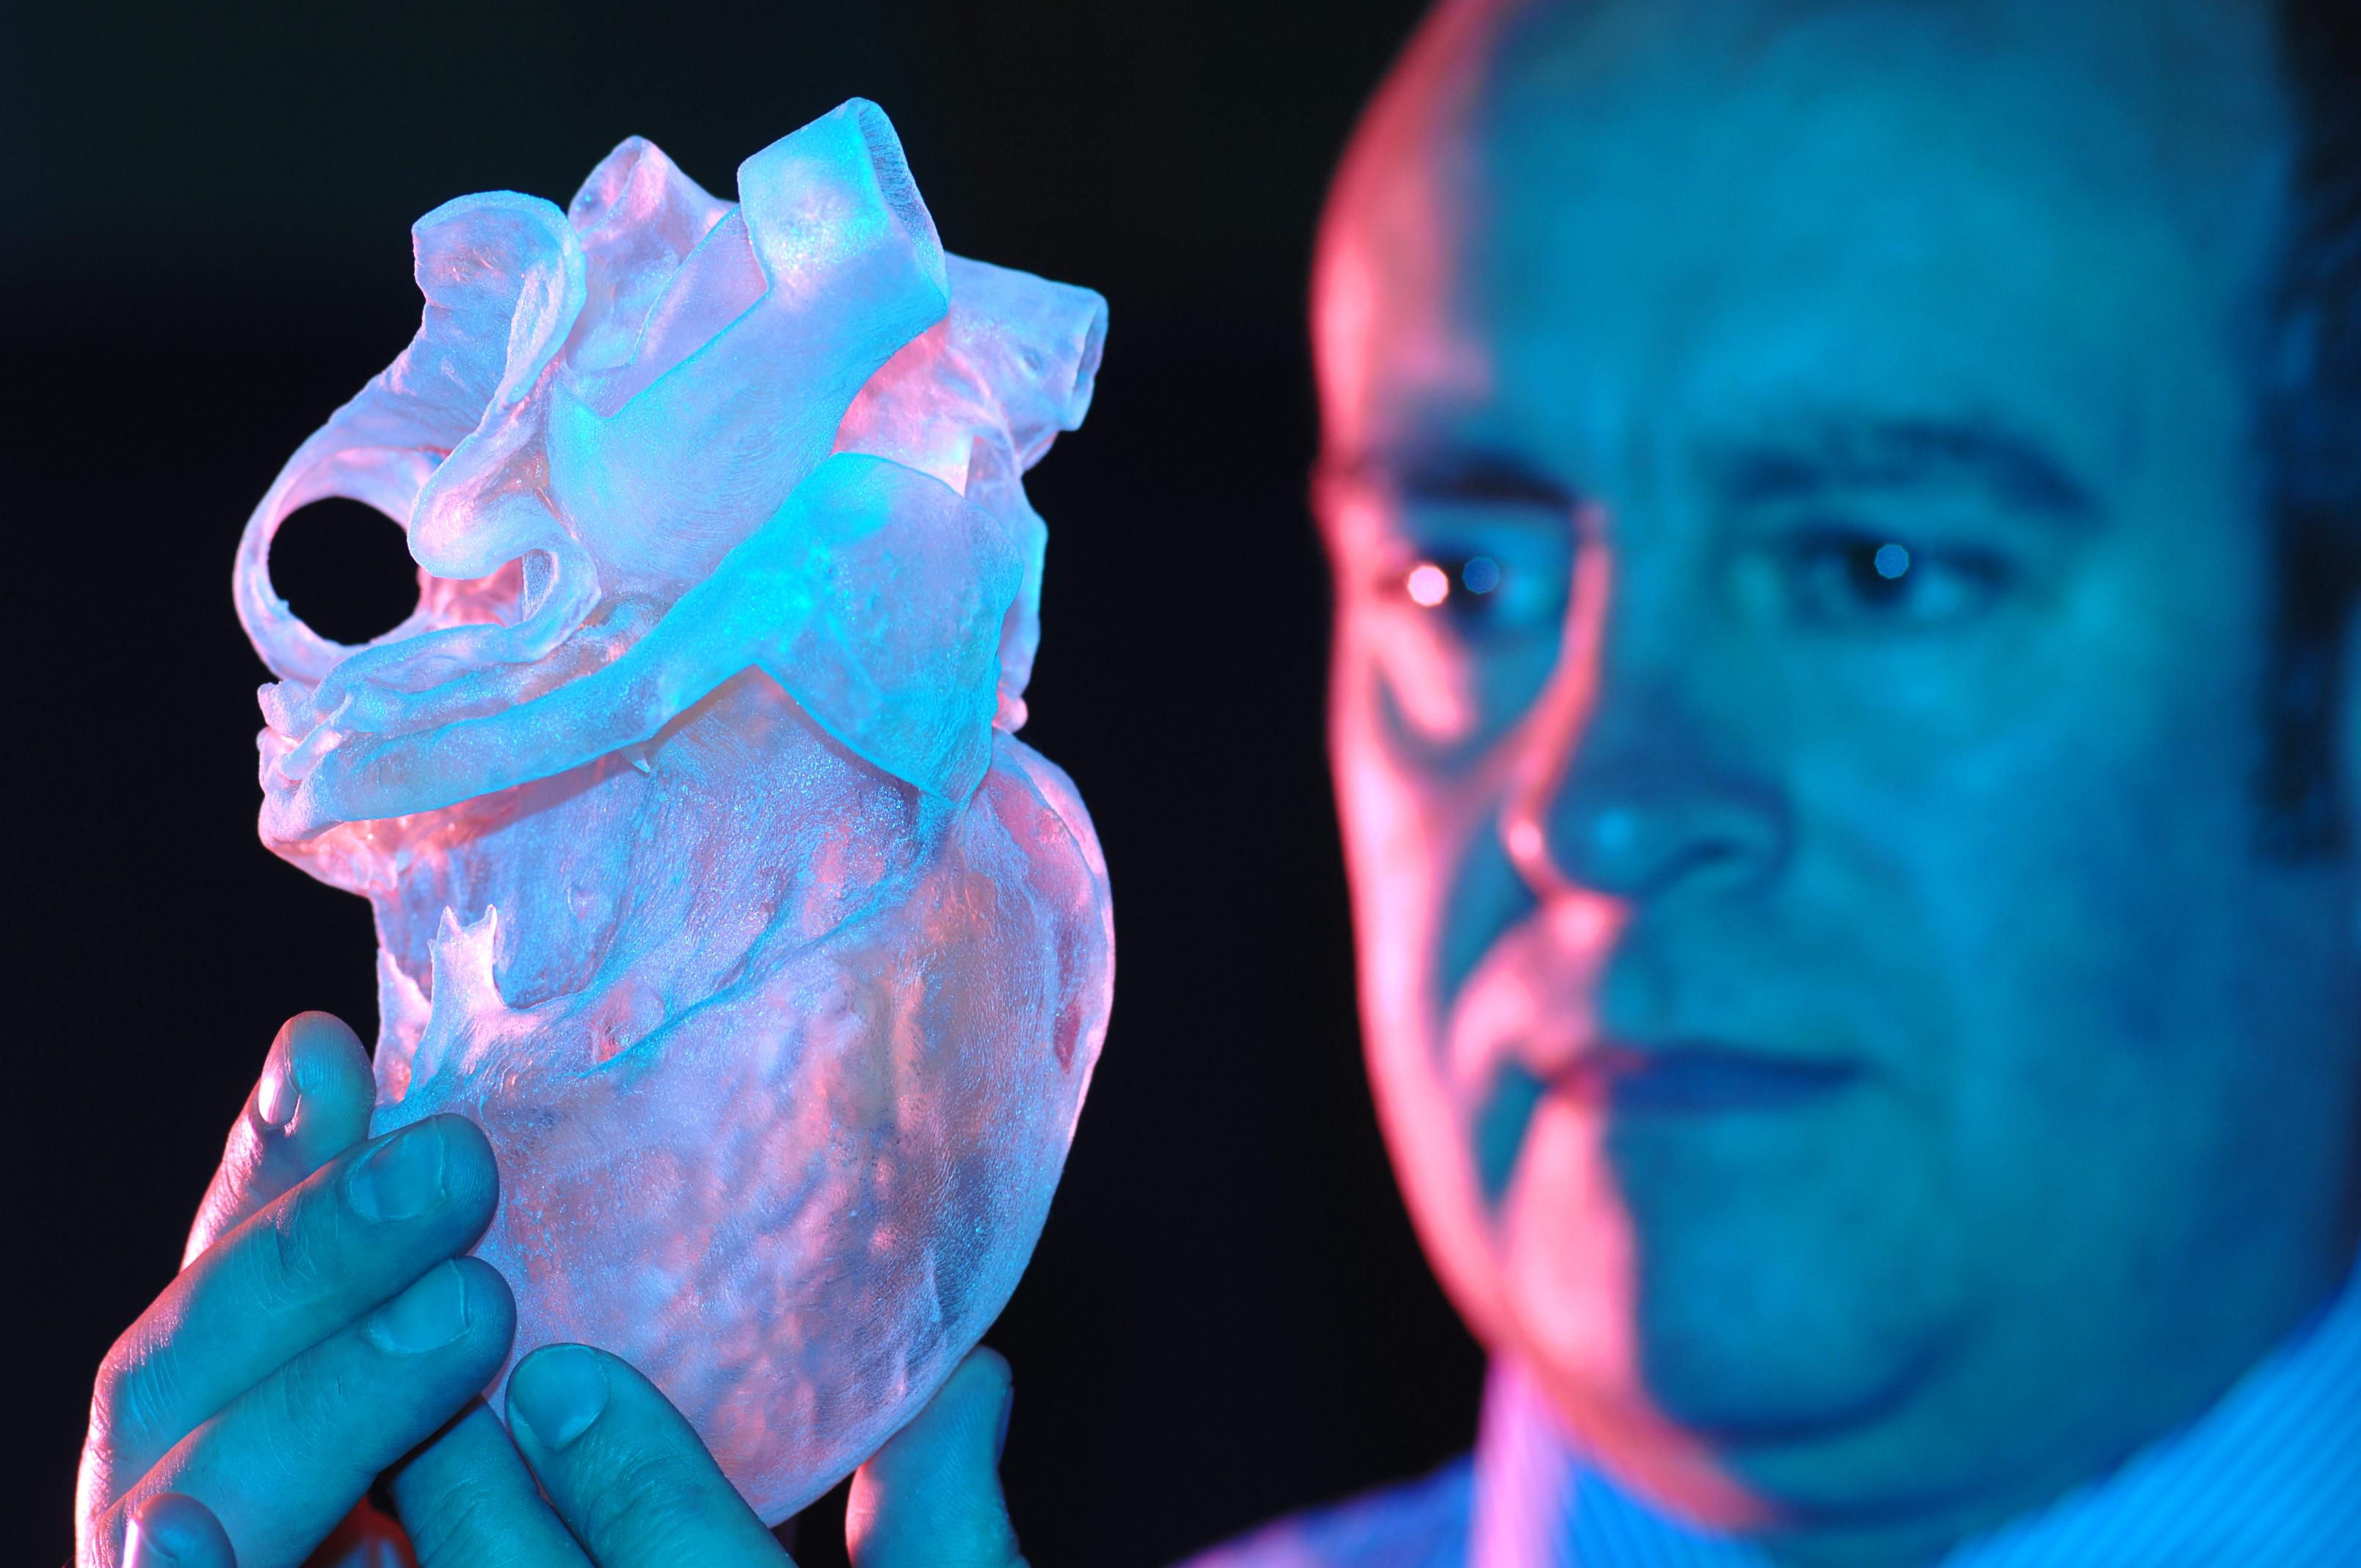 3d Printing Brings Da Vincis Anatomical Drawings To Life Wmg News